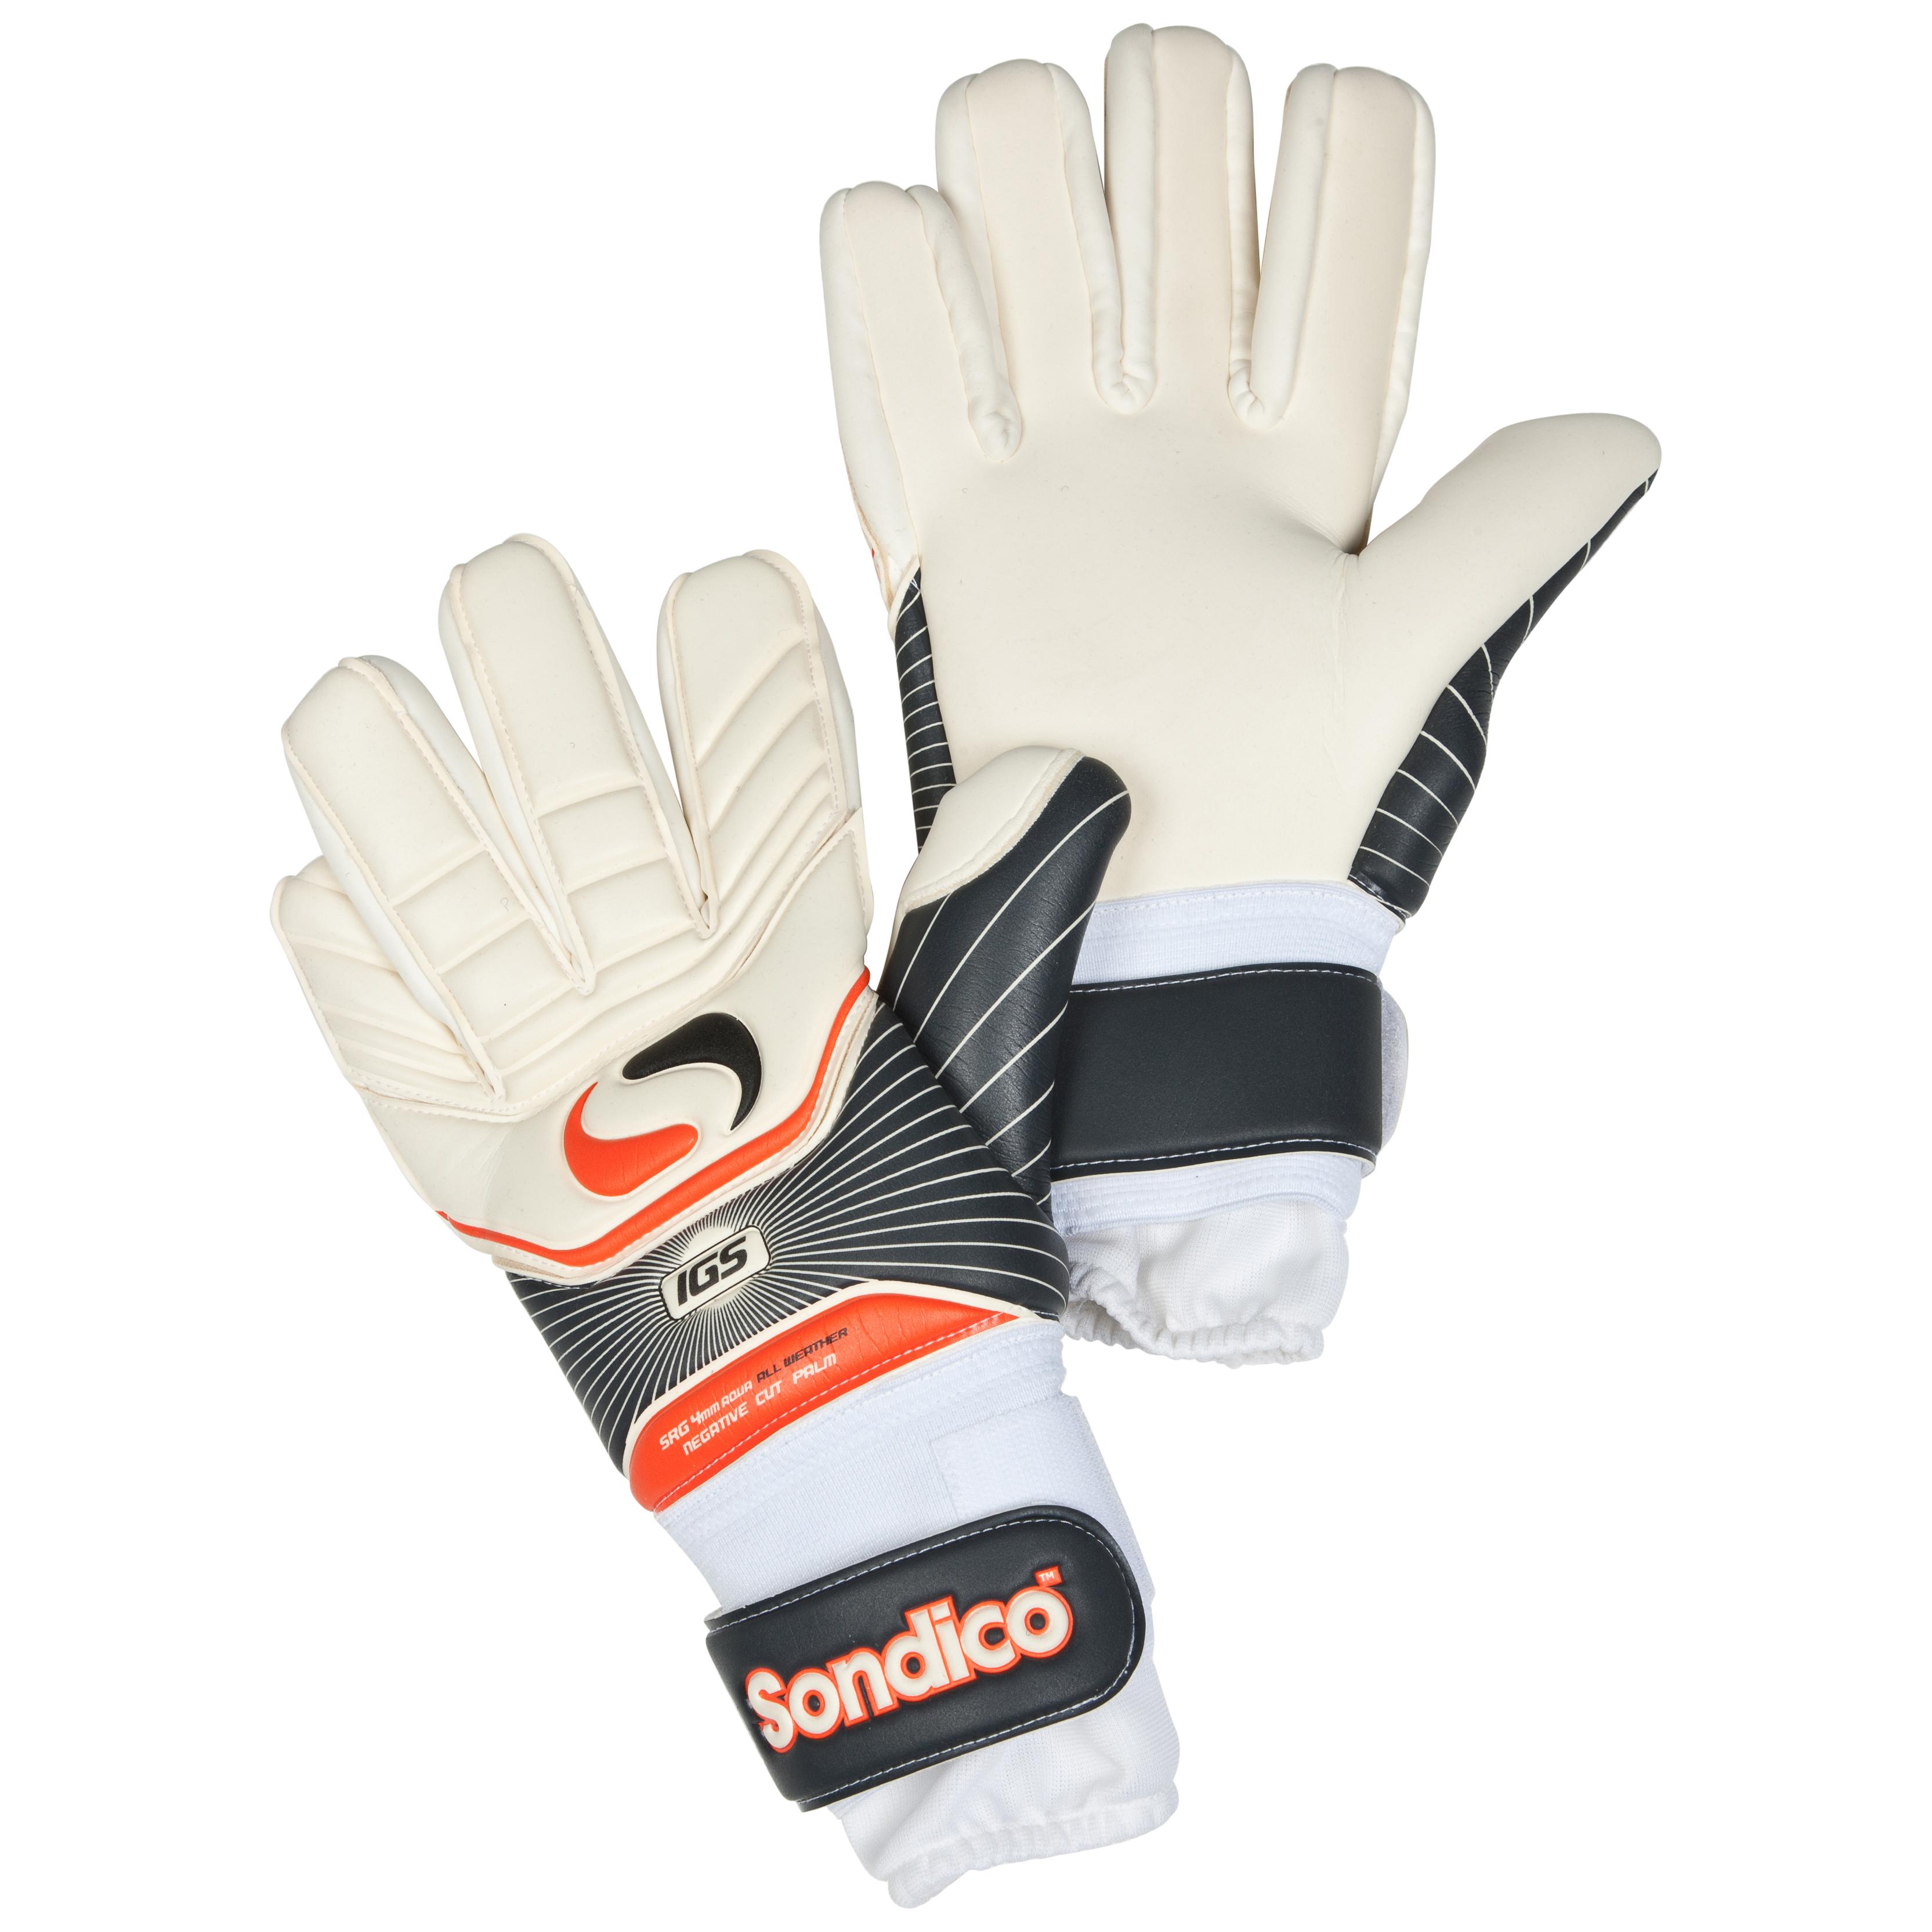 Sondico Ultima Pro Negative Cut Goalkeeper Gloves - Black/White/Gun Metal/Orange